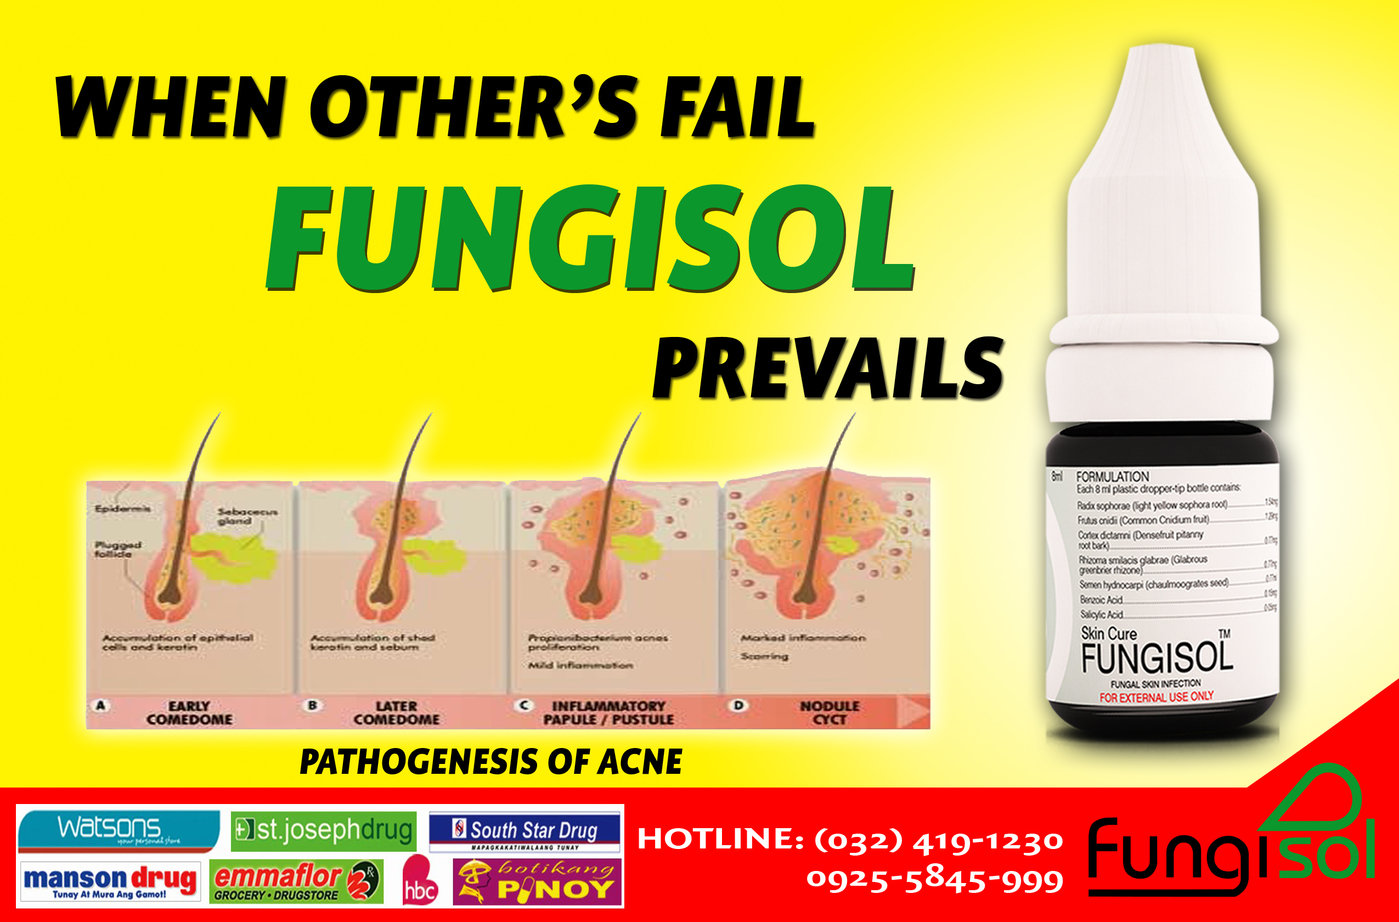 Fungisol Advertisement by Marilyn Sisa at Coroflotcom